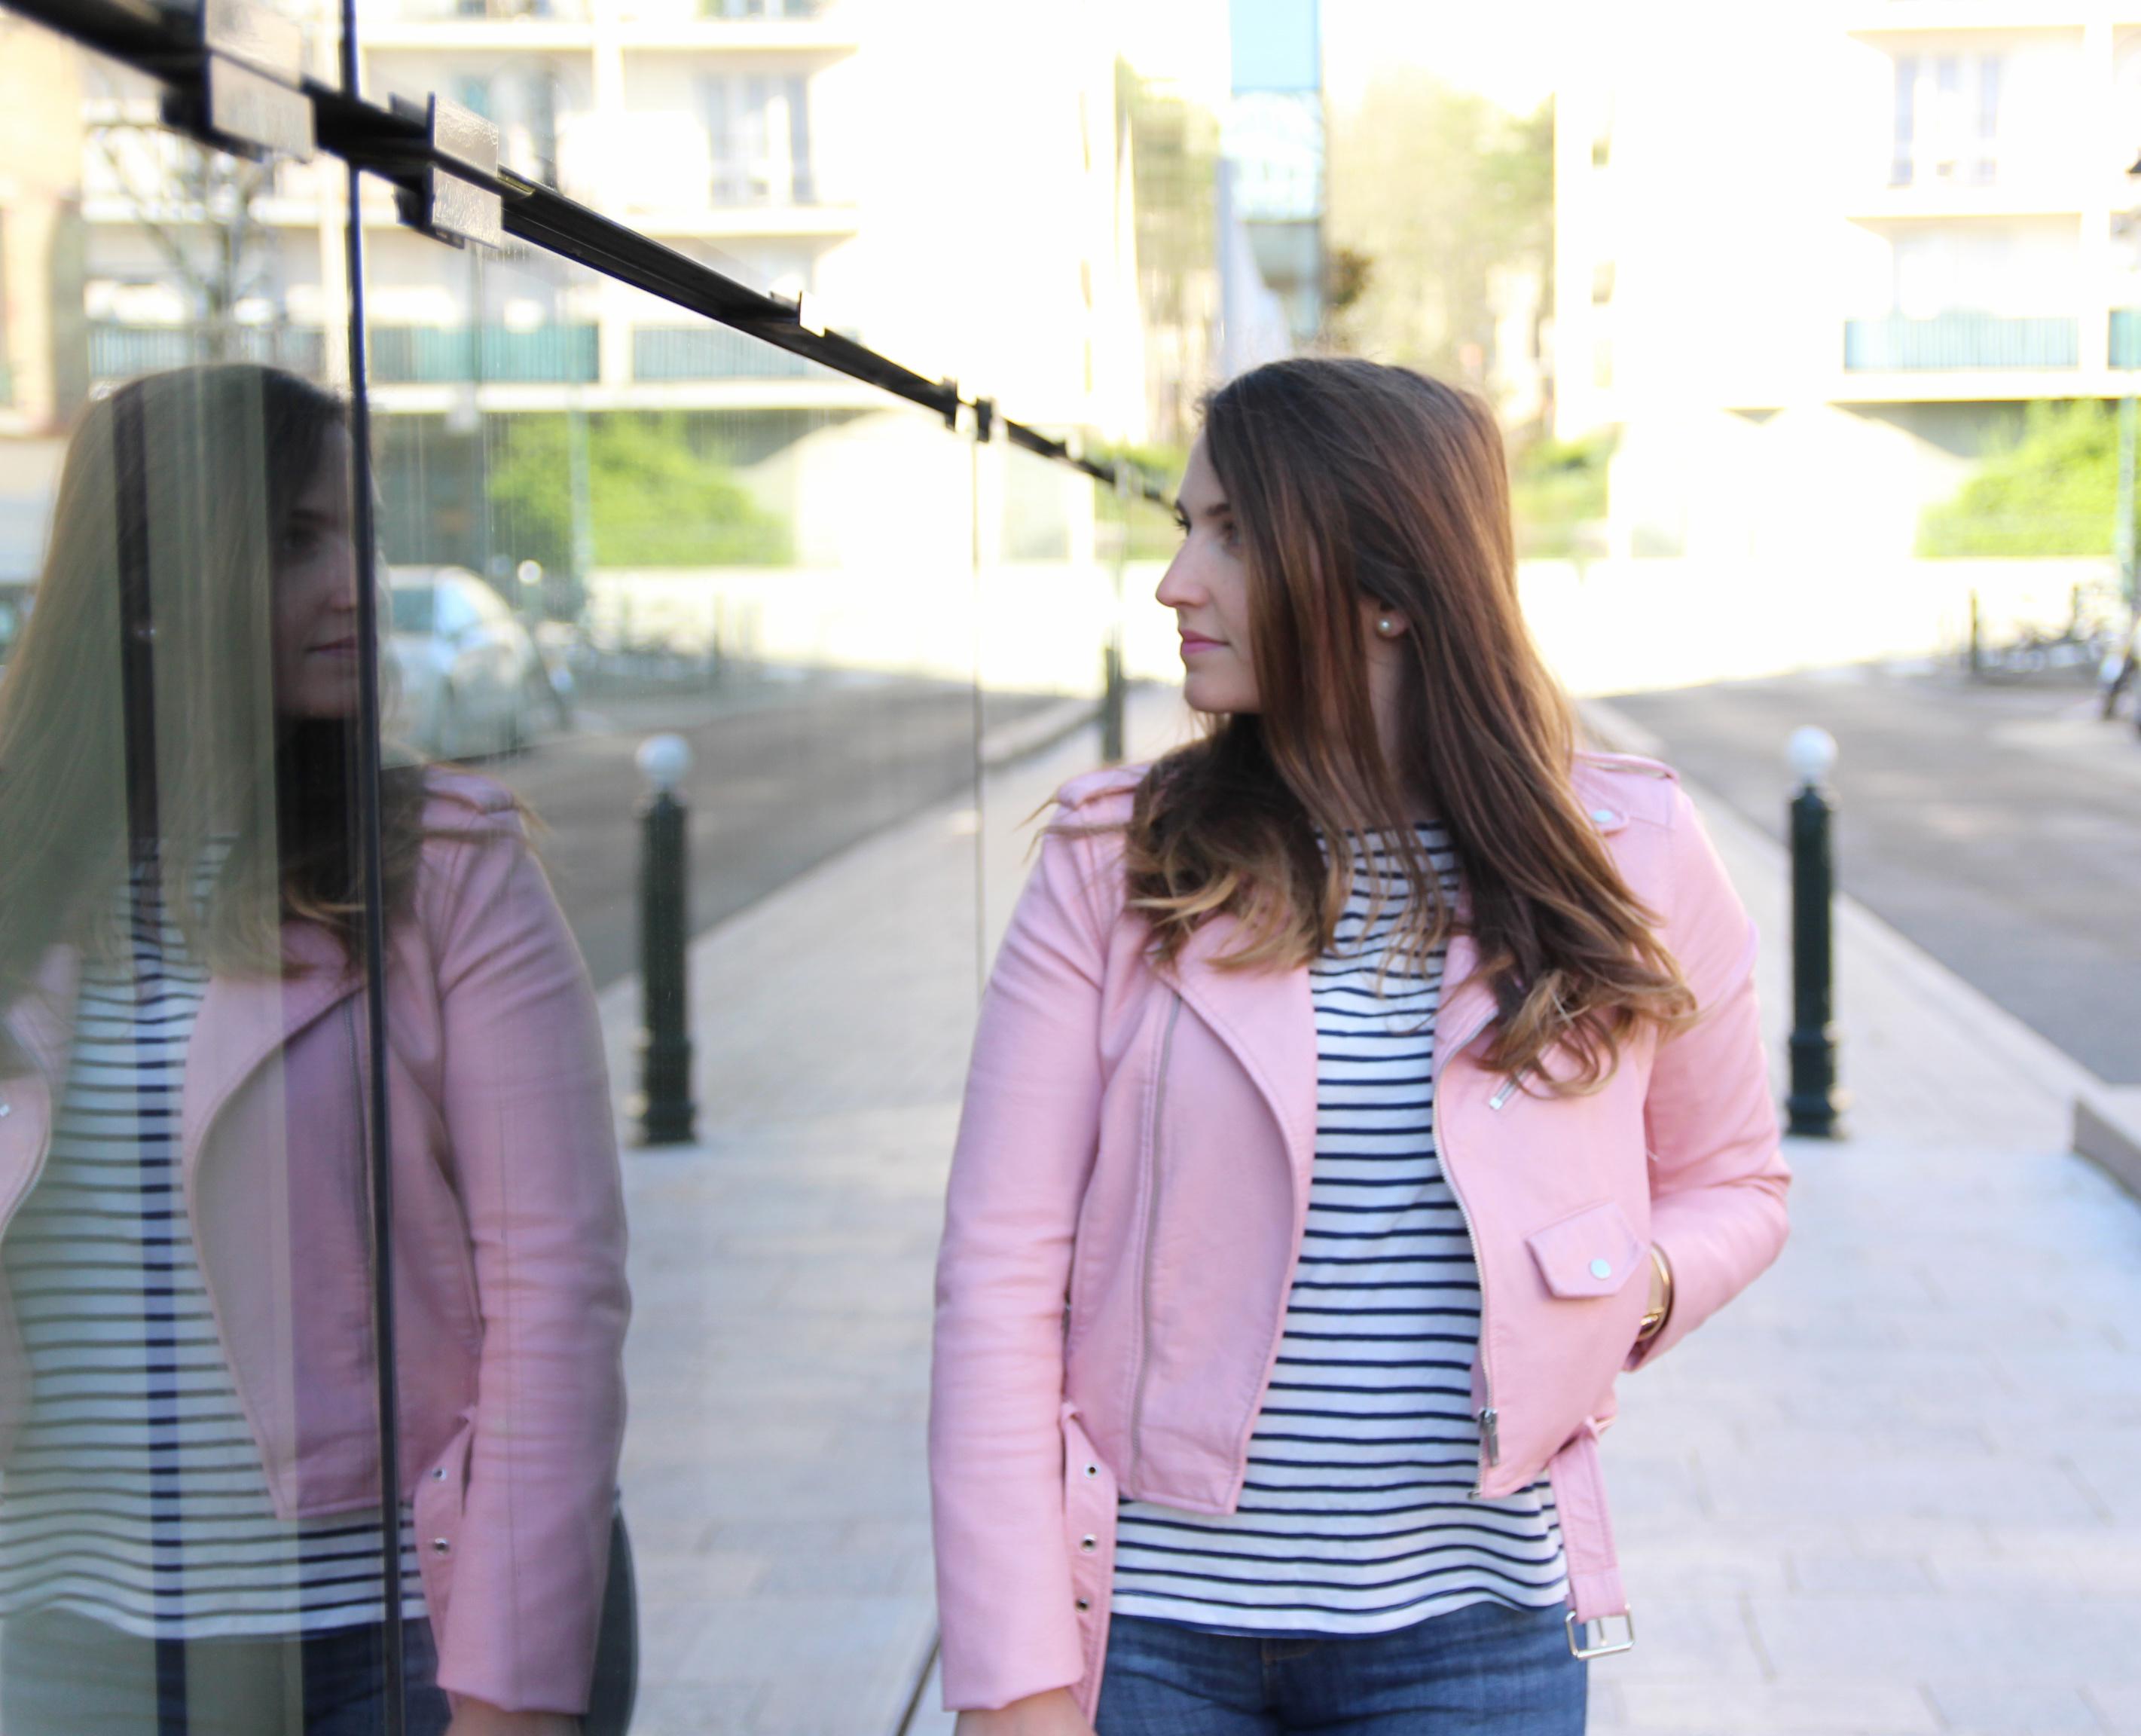 perfecto-rose-zara-marinniere-denim-influencer-fashion-ottd-look-seralynepointcom-paris-IMG_7021